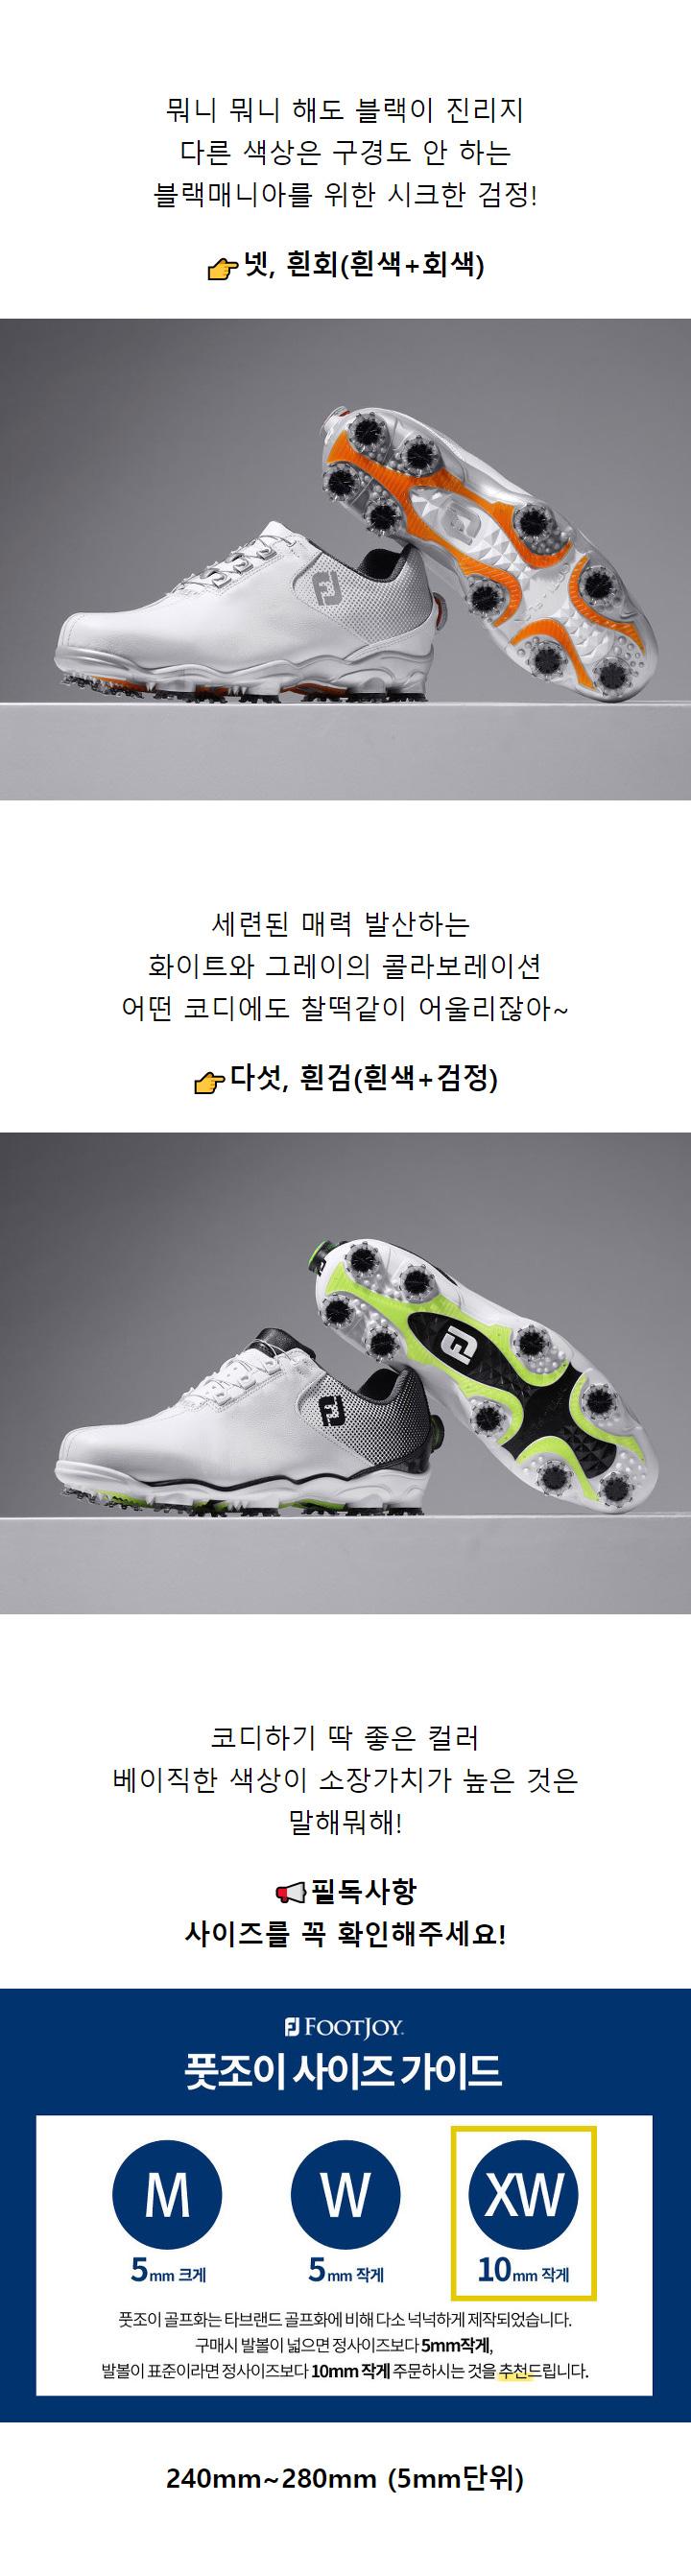 footjoy_dna_helix_boa_xw_22.jpg